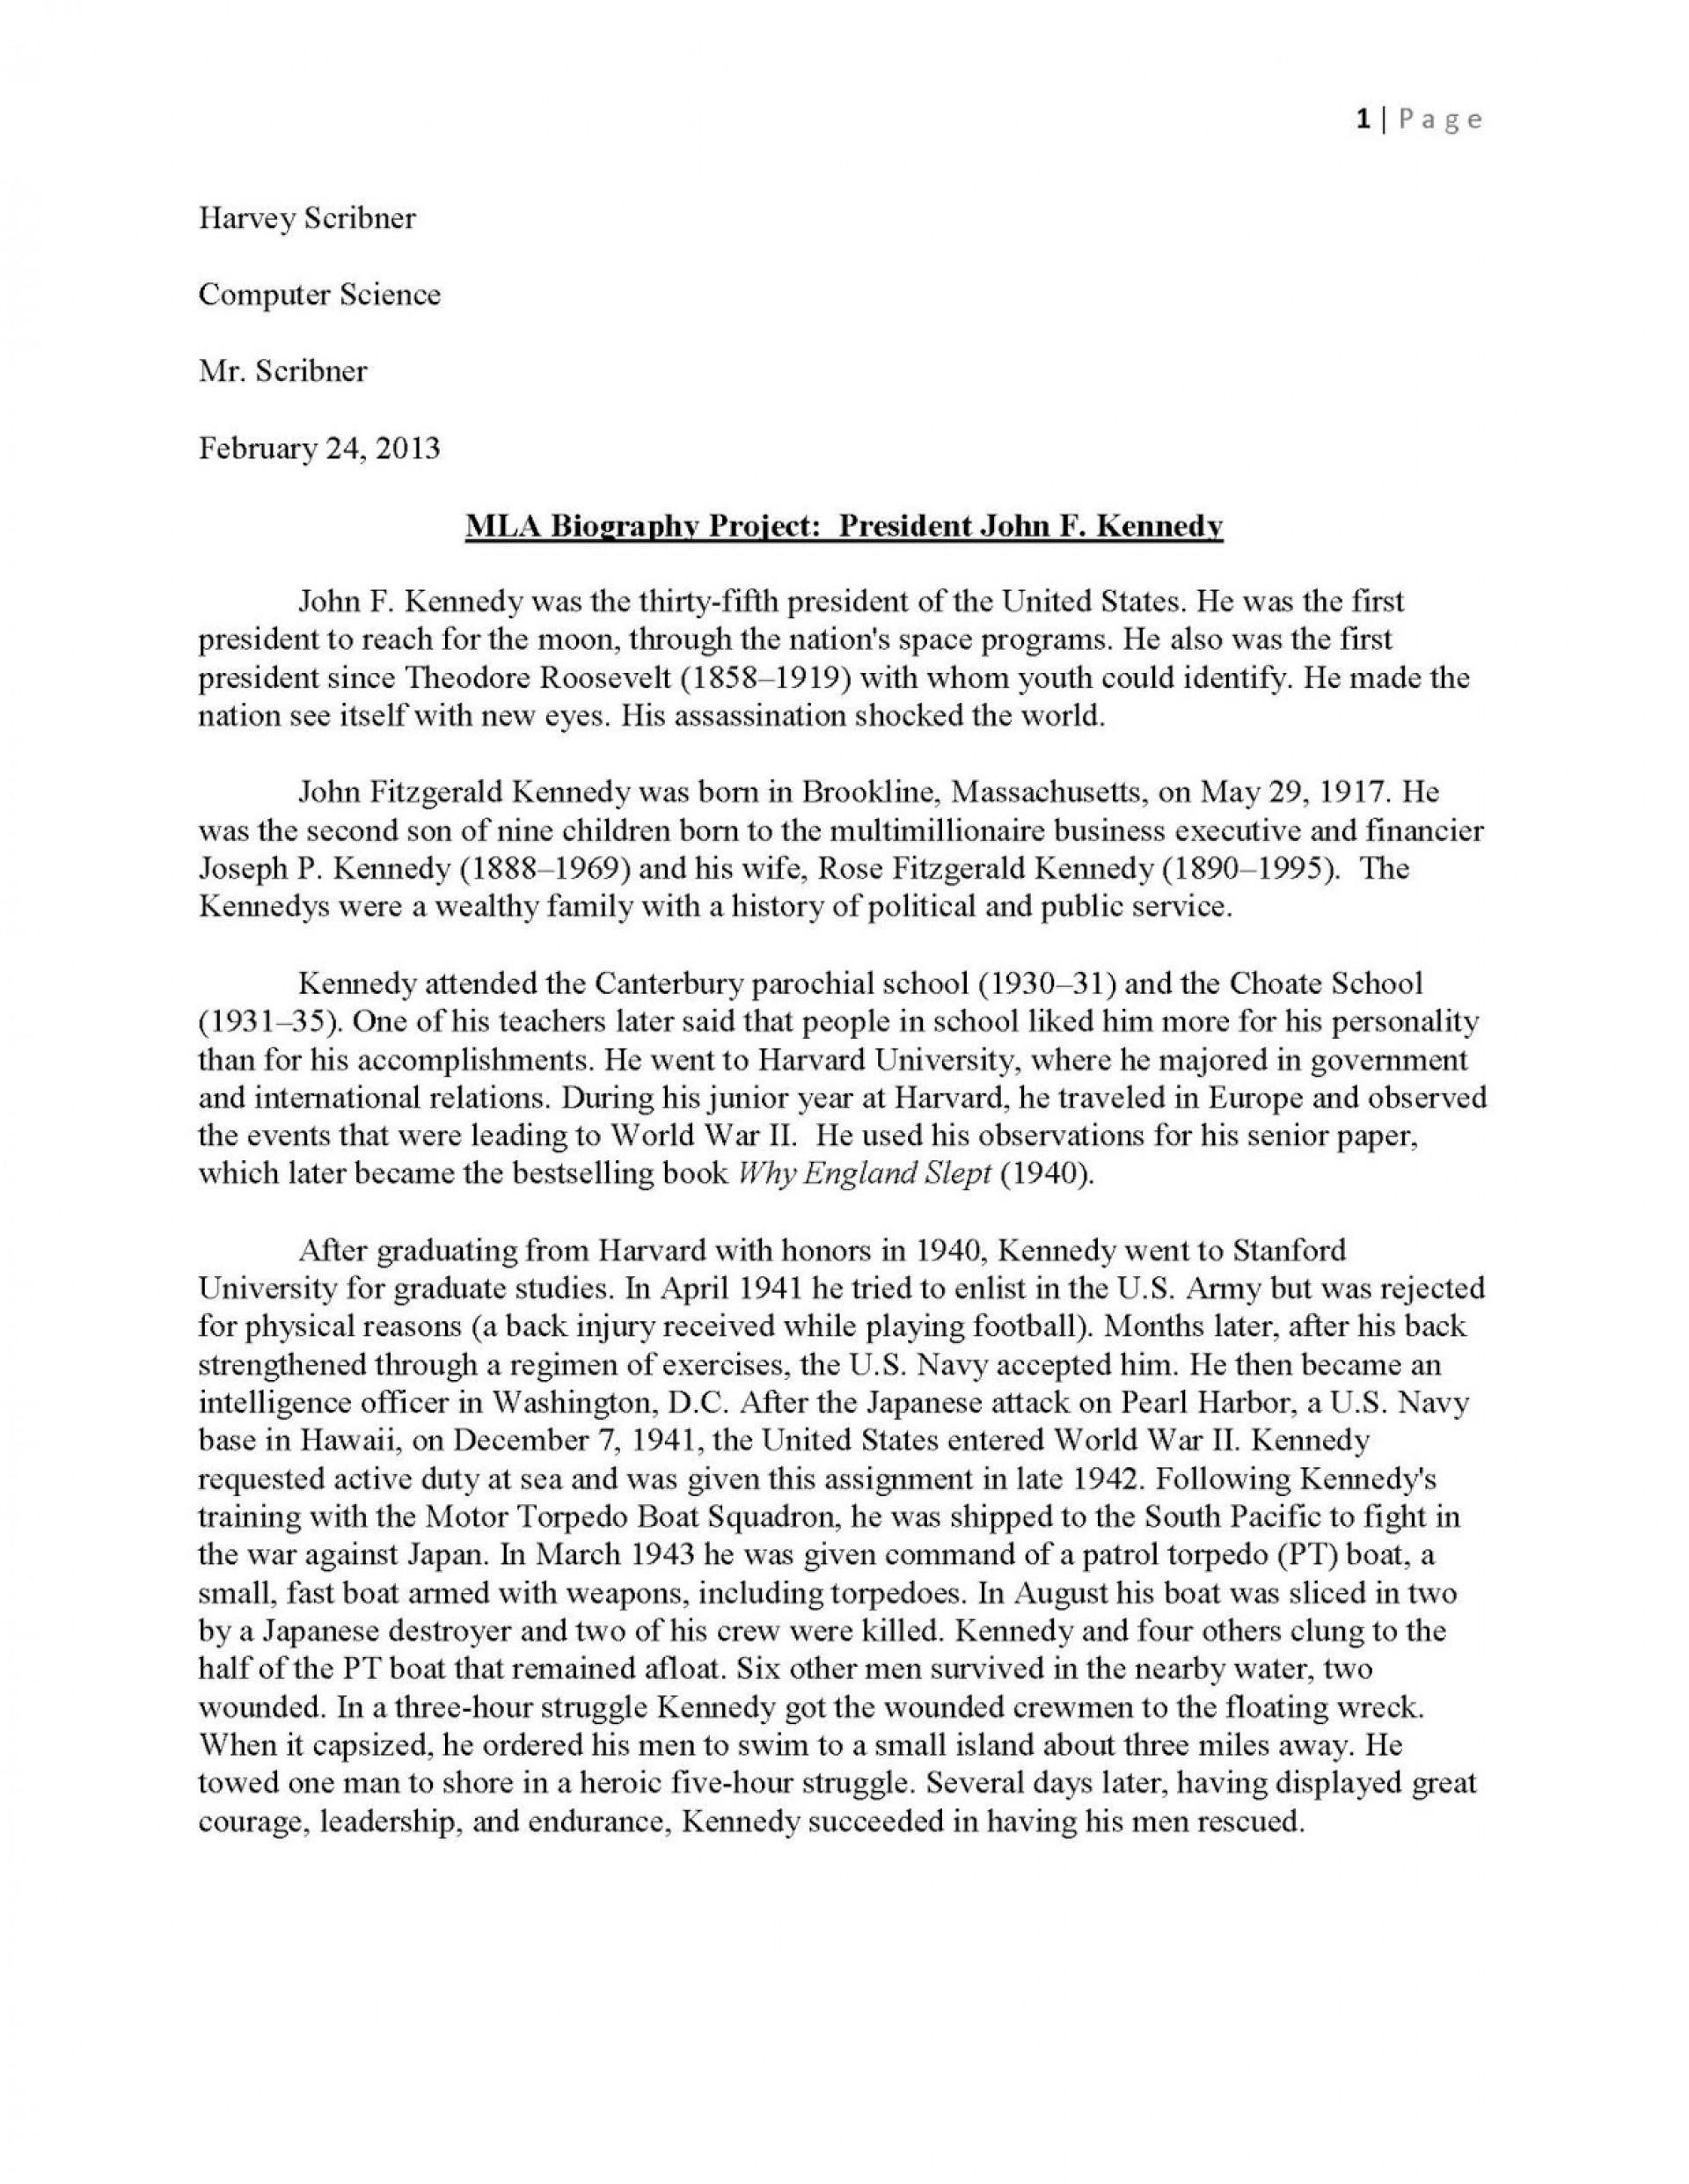 012 Jfkmlashortformbiographyreportexample Page 1 Essay Example Unique Autobiography Of About Yourself Tagalog Bio For Students 1920